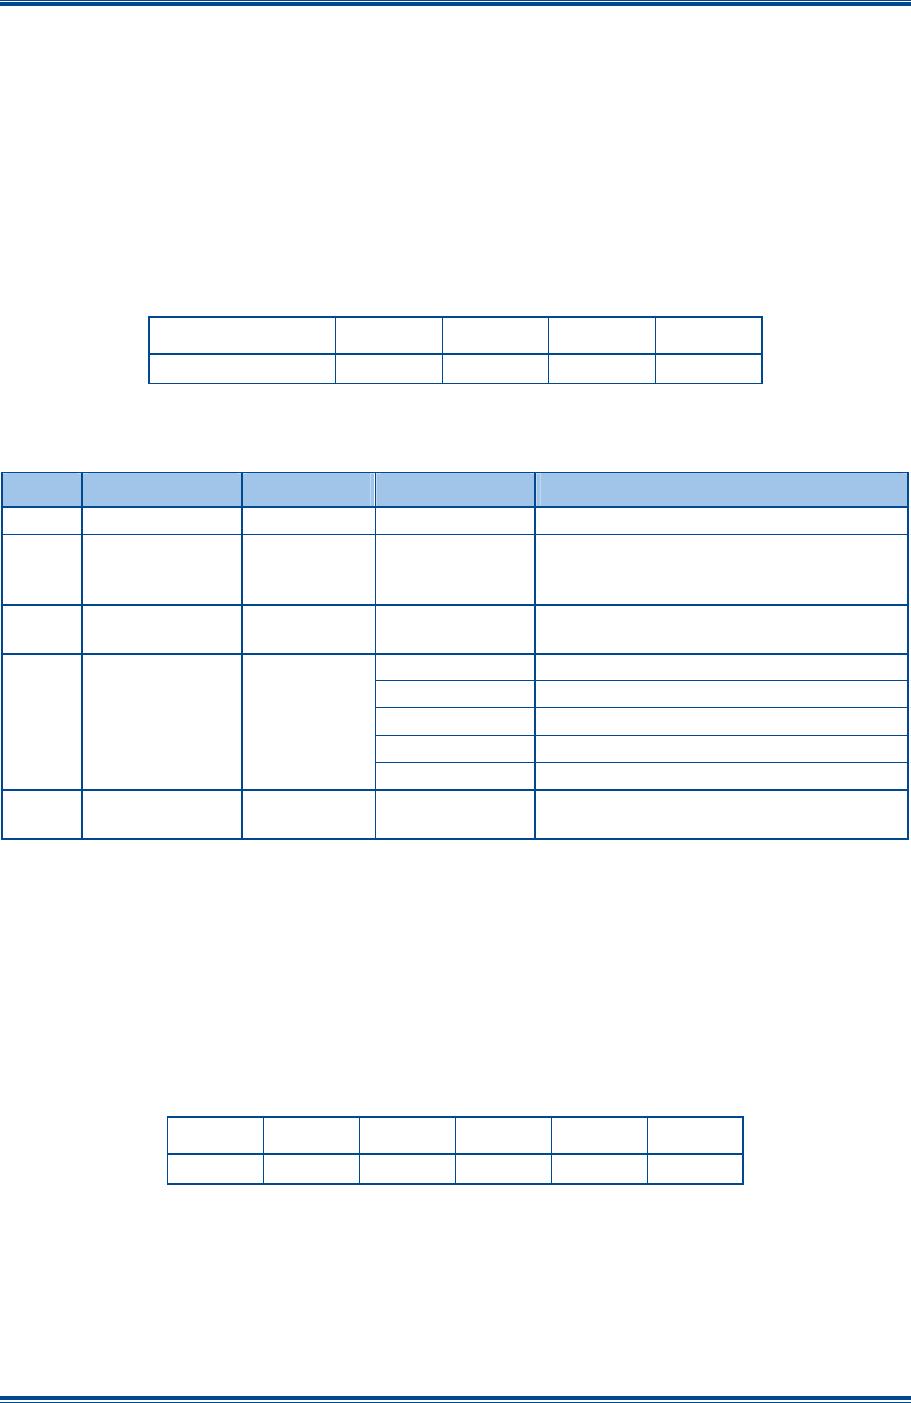 Simoco Emea Sdb670ac01 25w Dc Ac Band Sdb670 User Manual Ip Fuse Panelcar Wiring Diagram Service Tnm M E 0032